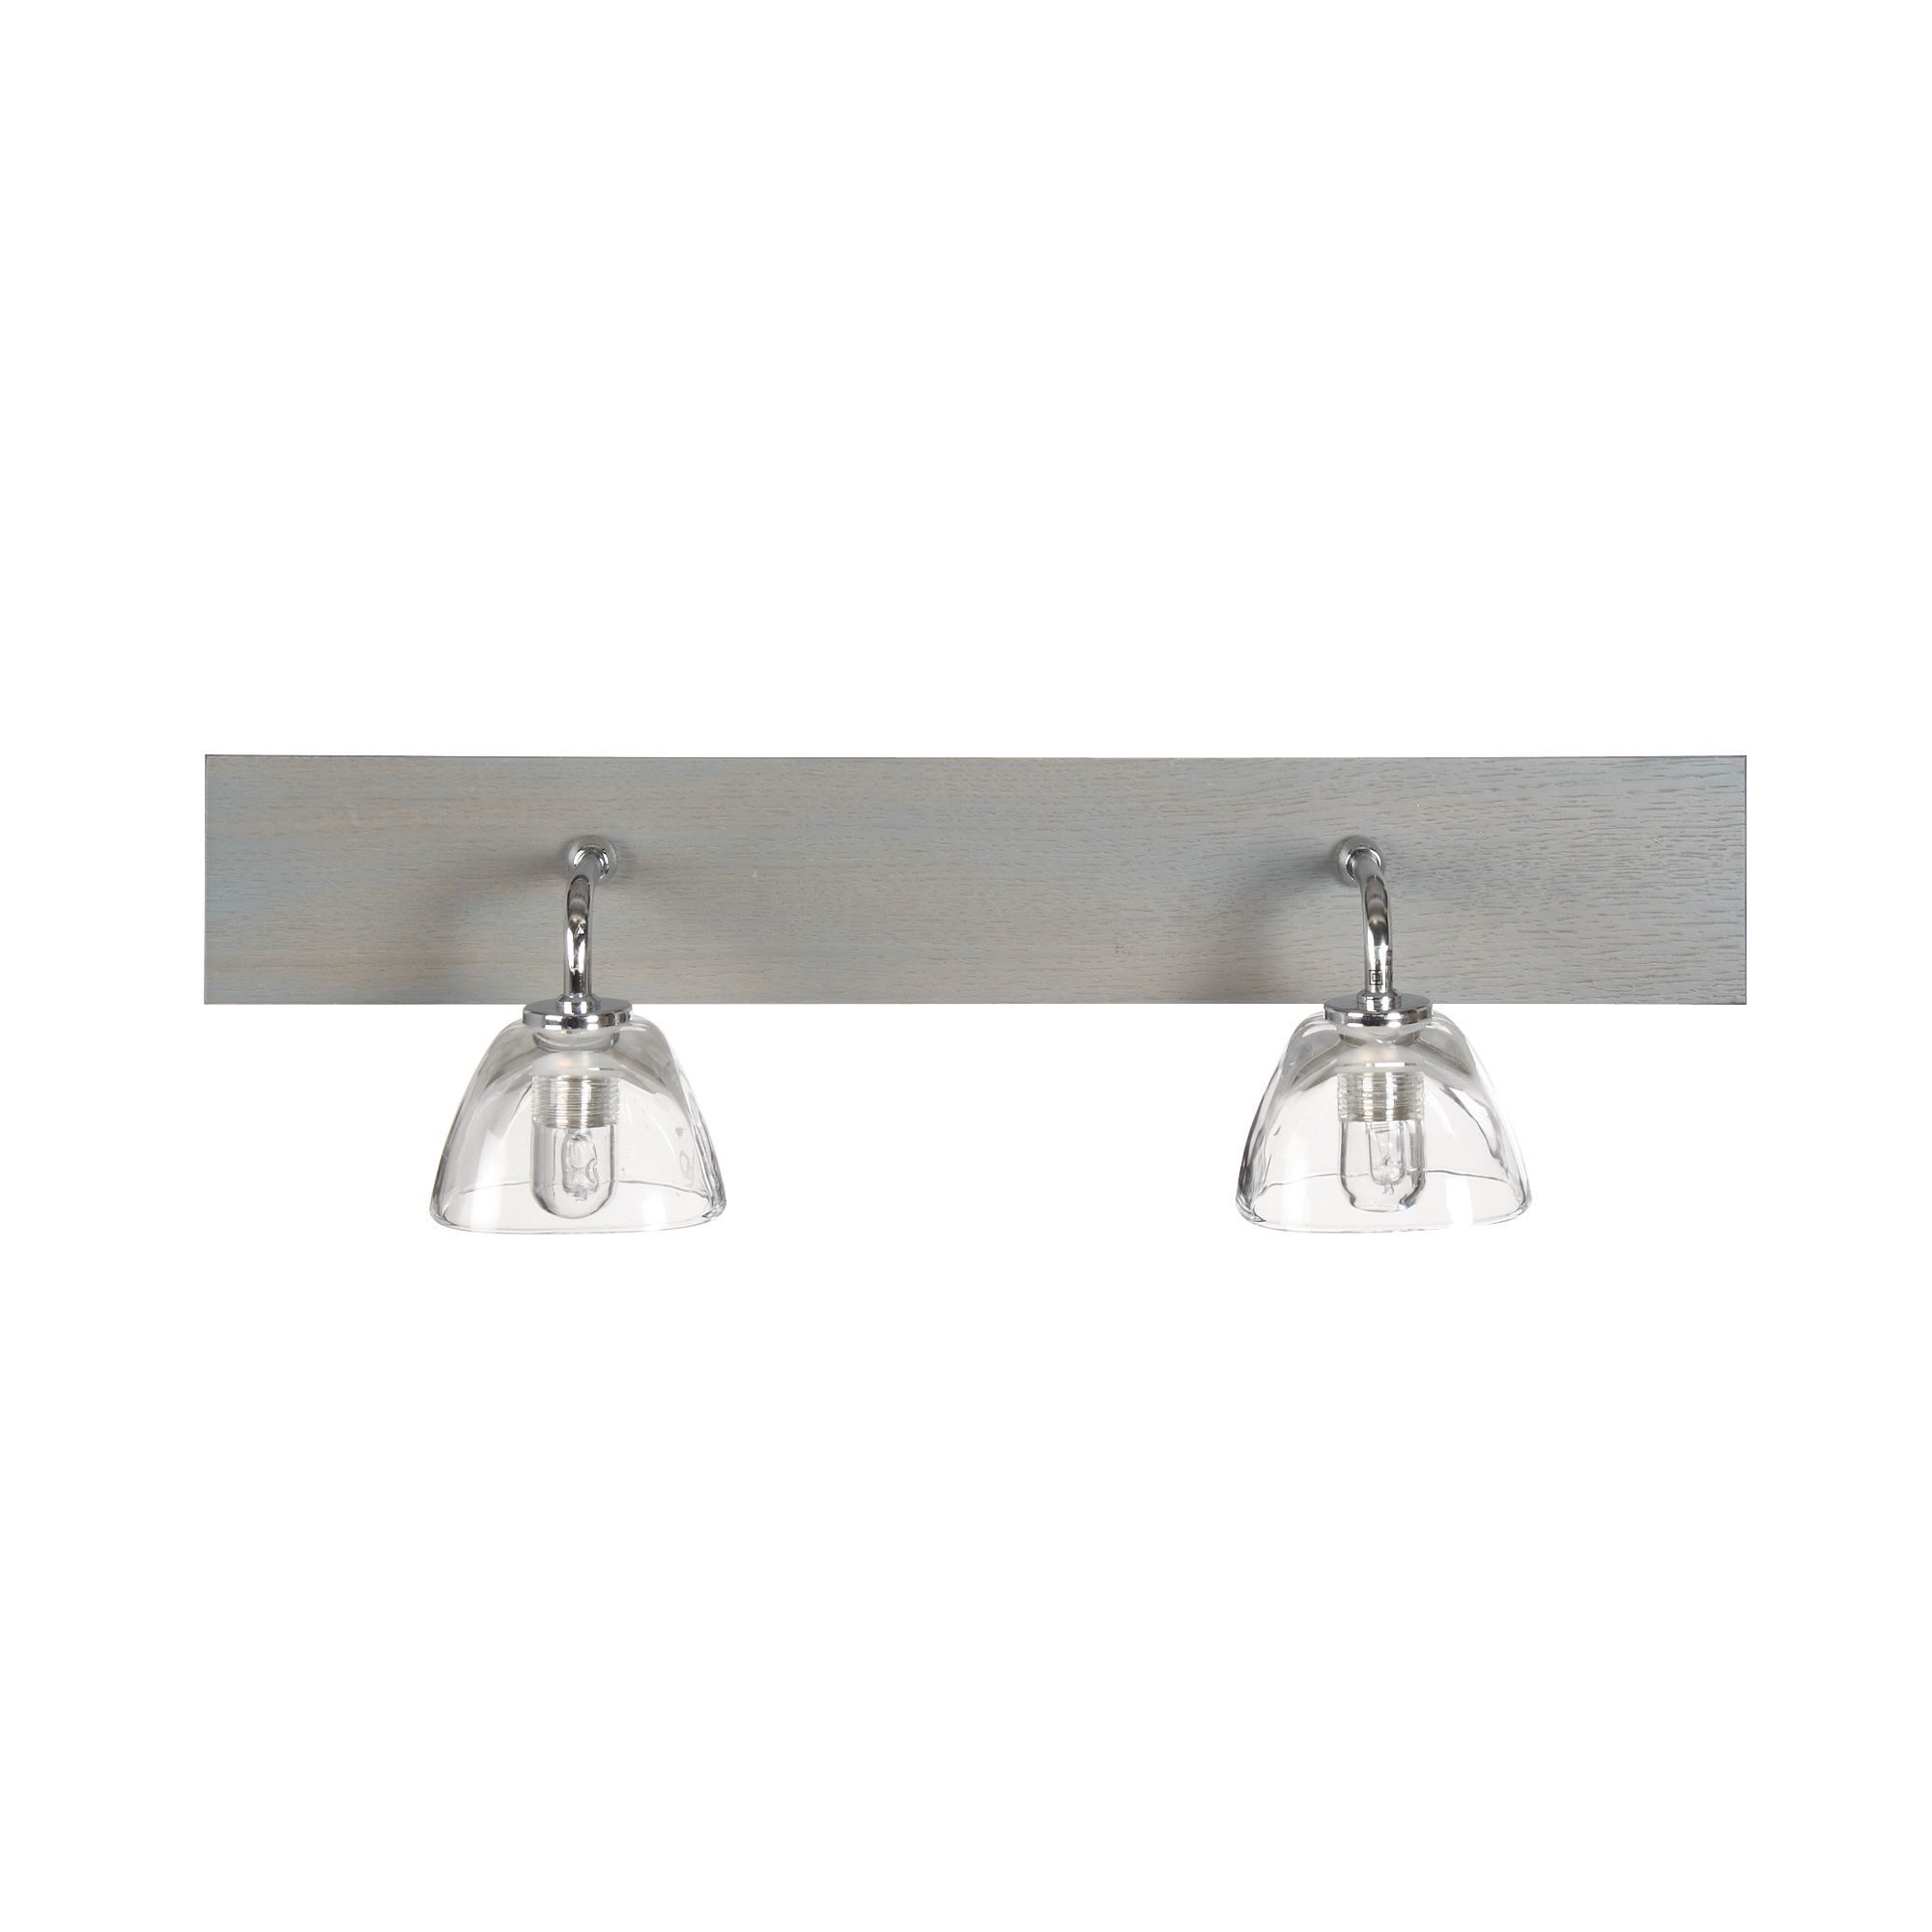 applique 2 lumi res de salle de bain bois willwood promos du moment promos alin a fr. Black Bedroom Furniture Sets. Home Design Ideas